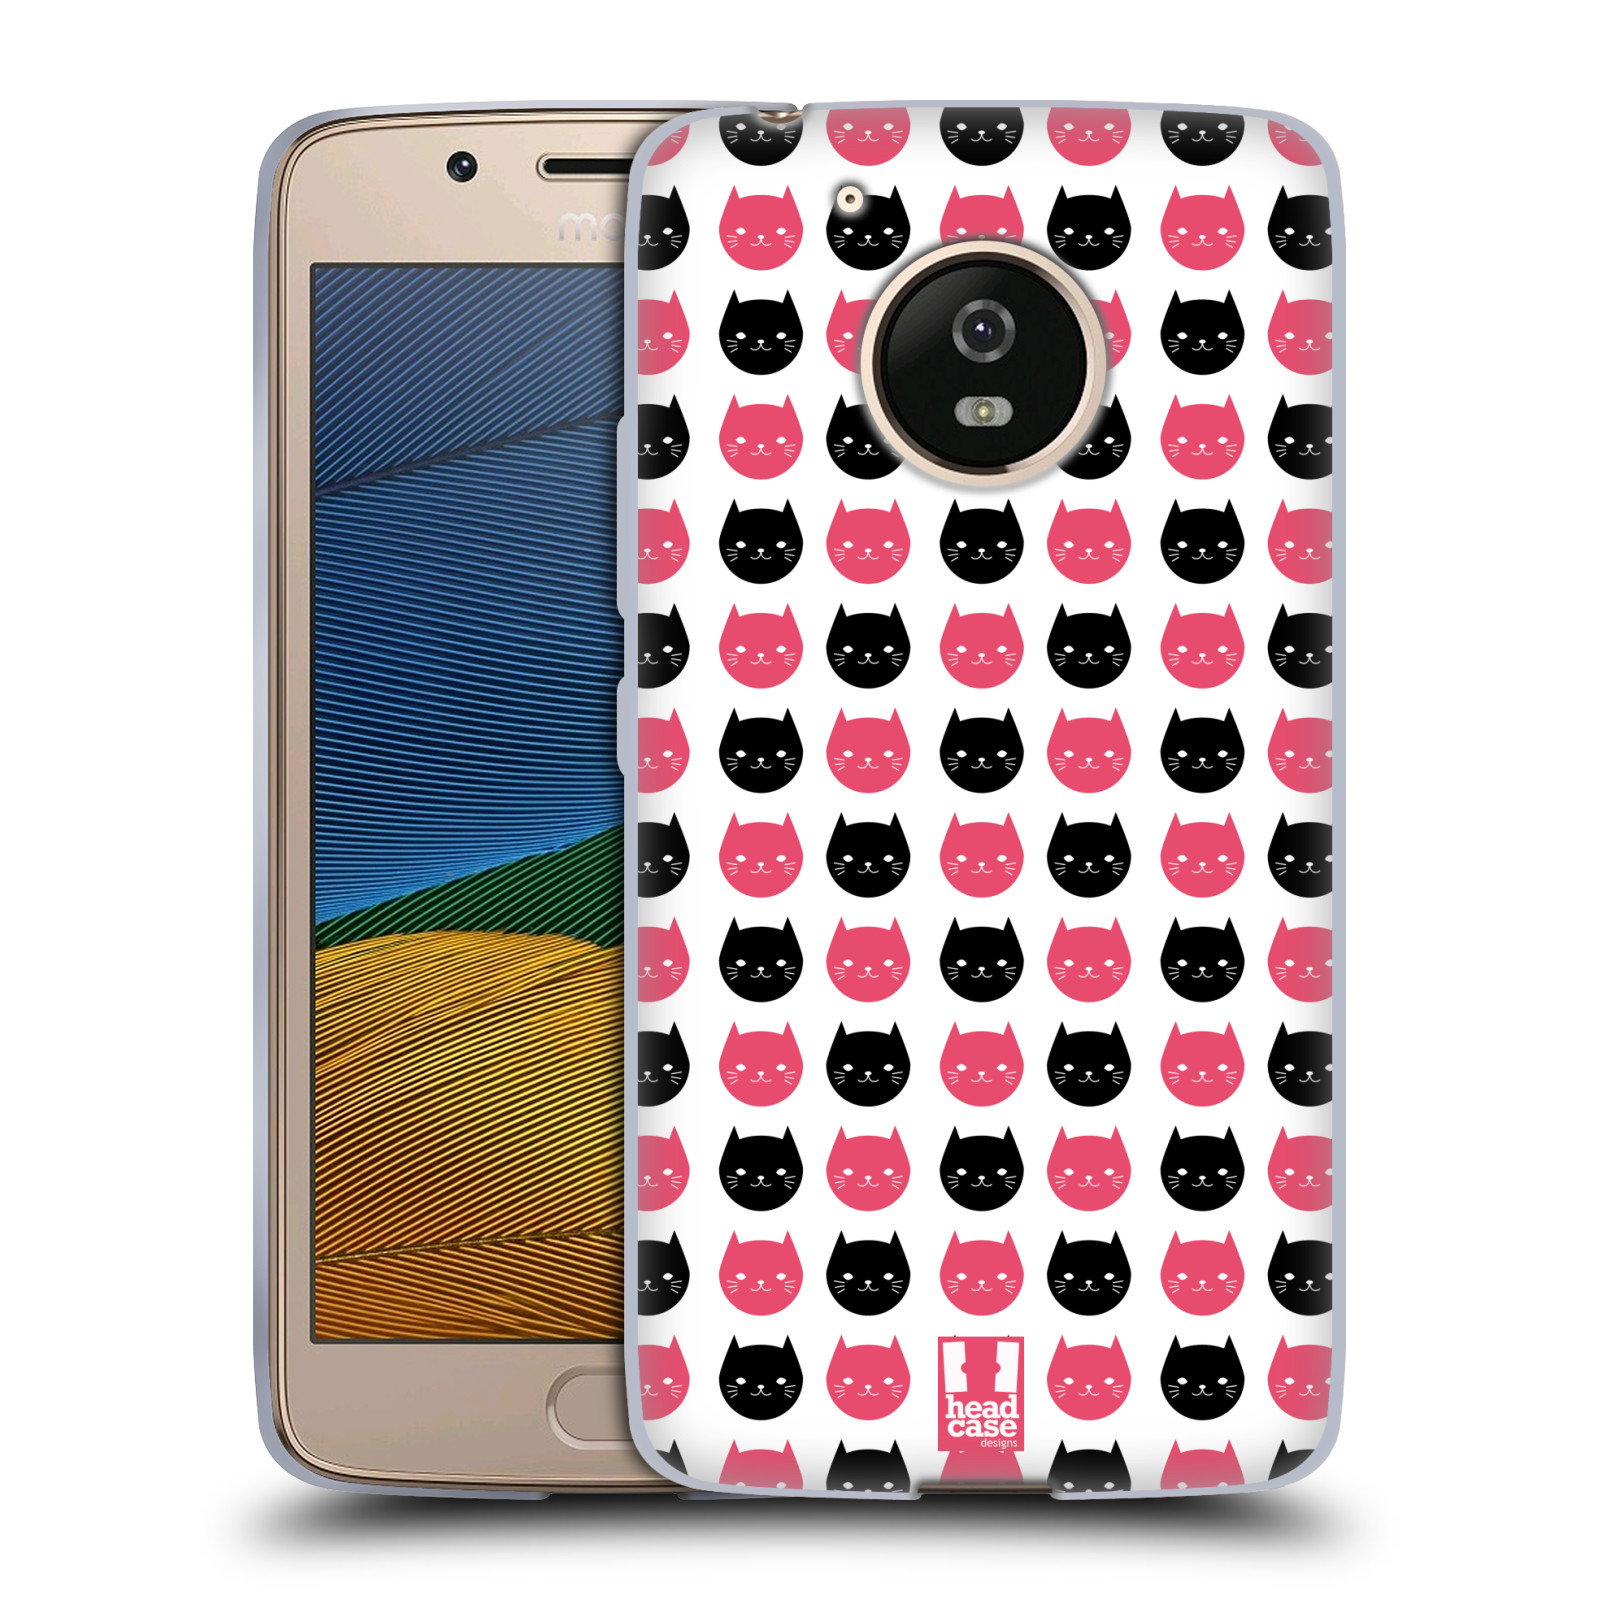 Silikonové pouzdro na mobil Lenovo Moto G5 - Head Case KOČKY Black and Pink (Silikonový kryt či obal na mobilní telefon Lenovo Moto G5)